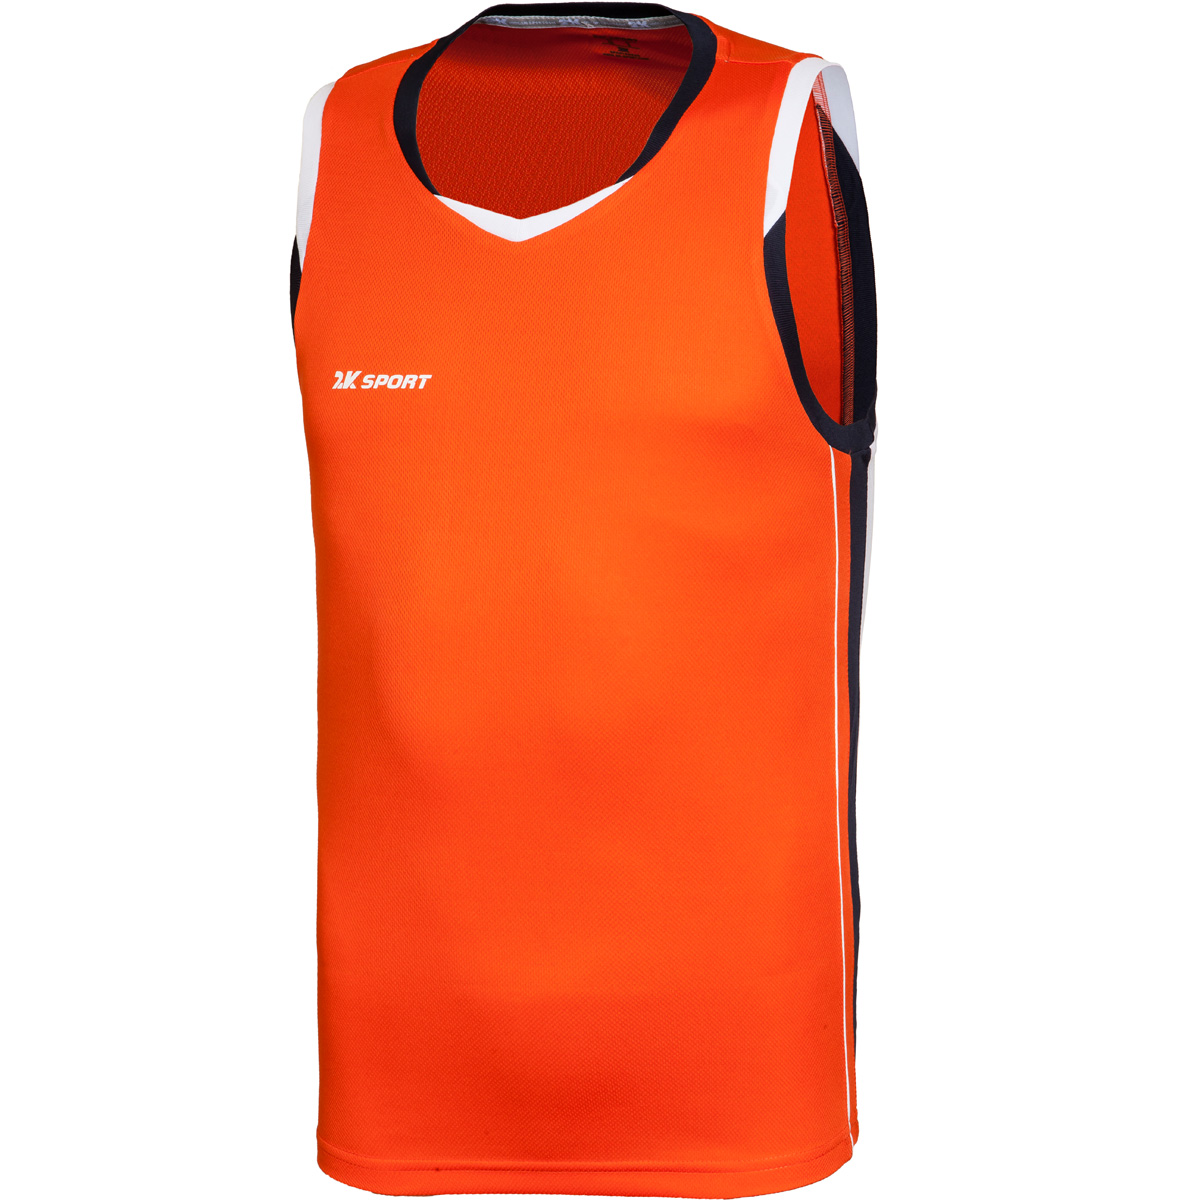 Майка баскетбольная мужская 2K Sport Advance, цвет: оранжевый, темно-синий, белый. 130030. Размер L (50) - Баскетбол